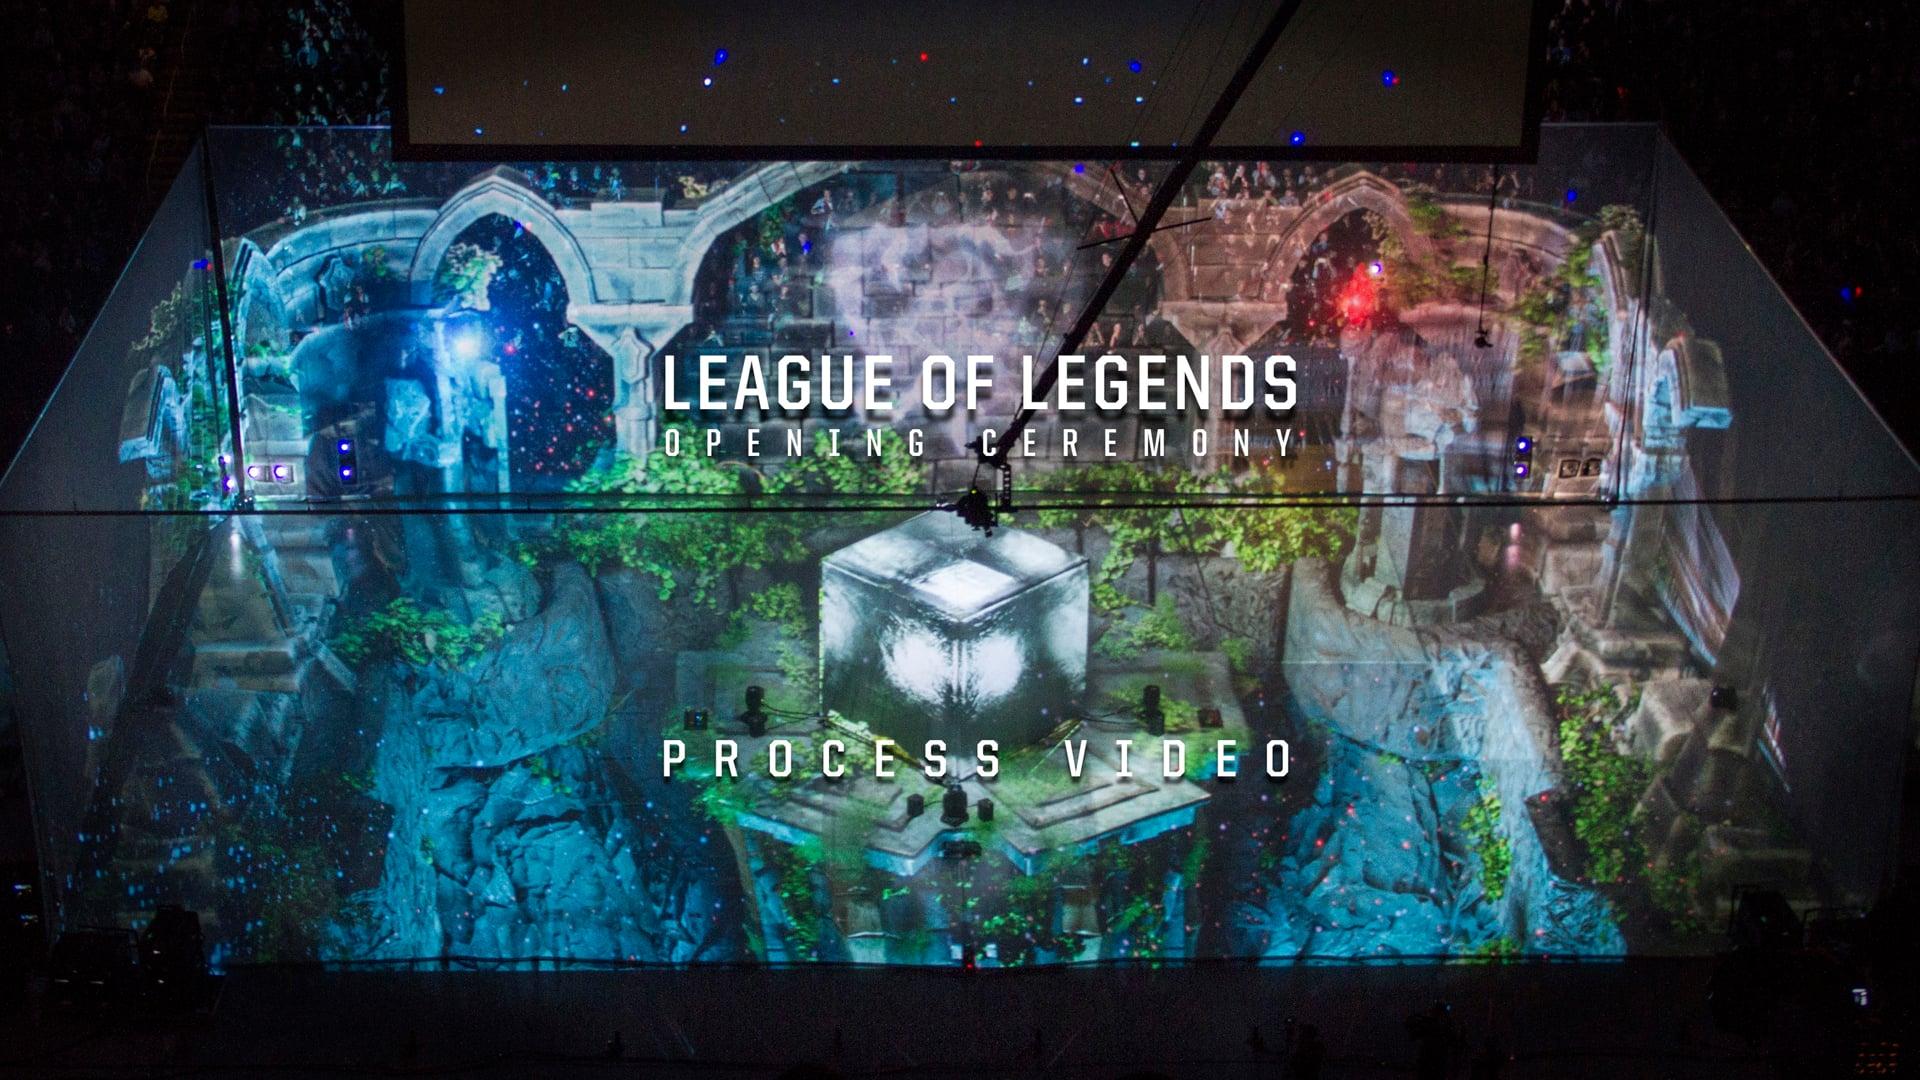 League of Legends: Worlds Opening Ceremony Breakdown